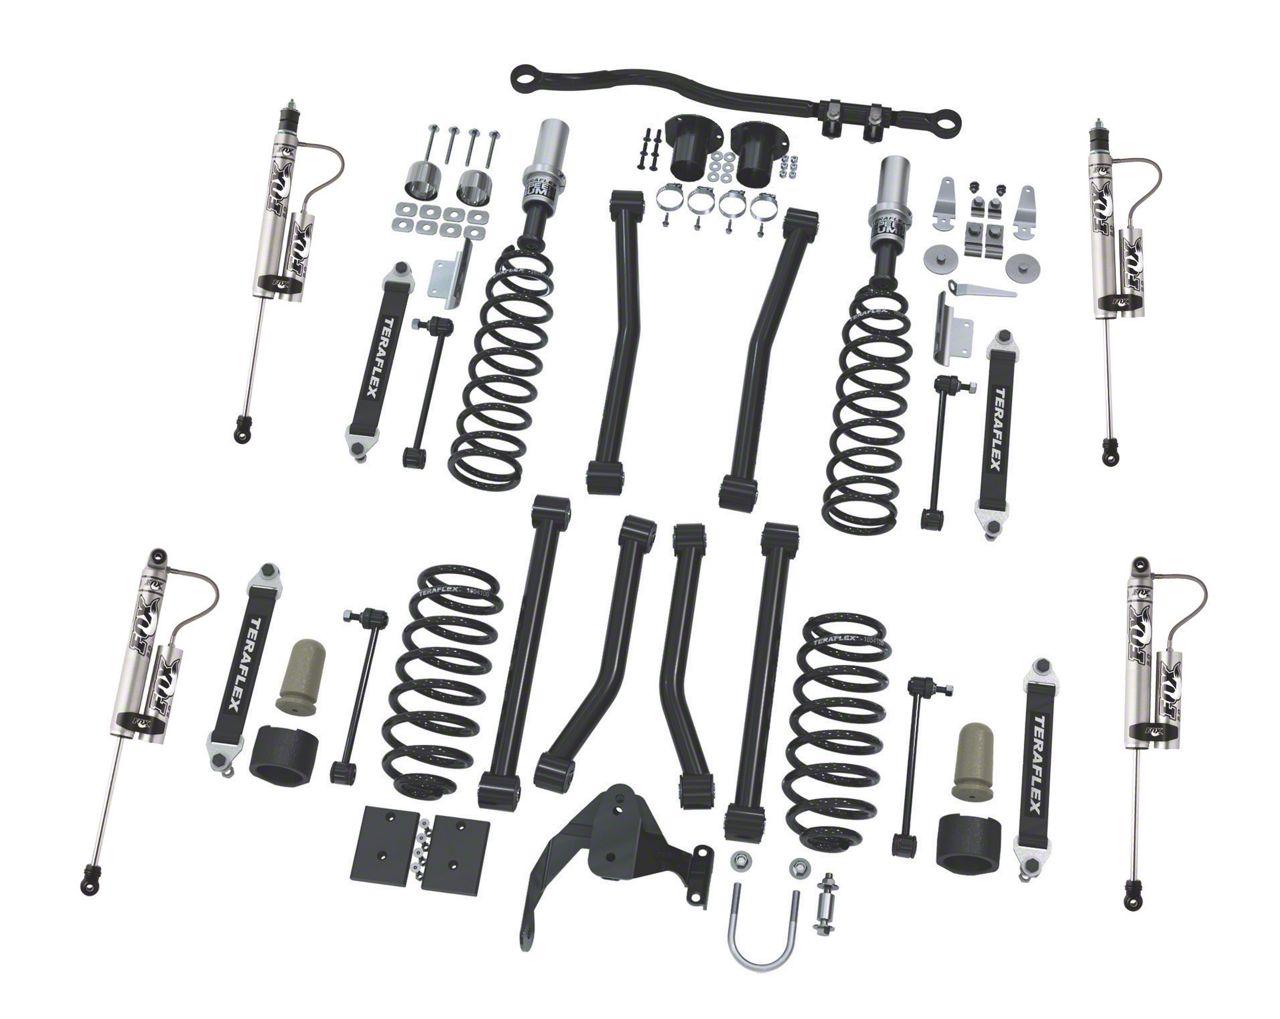 Teraflex 3 in. Sport S/T3 Suspension Lift Kit w/ Fox Shocks (07-18 Jeep Wrangler JK 2 Door)